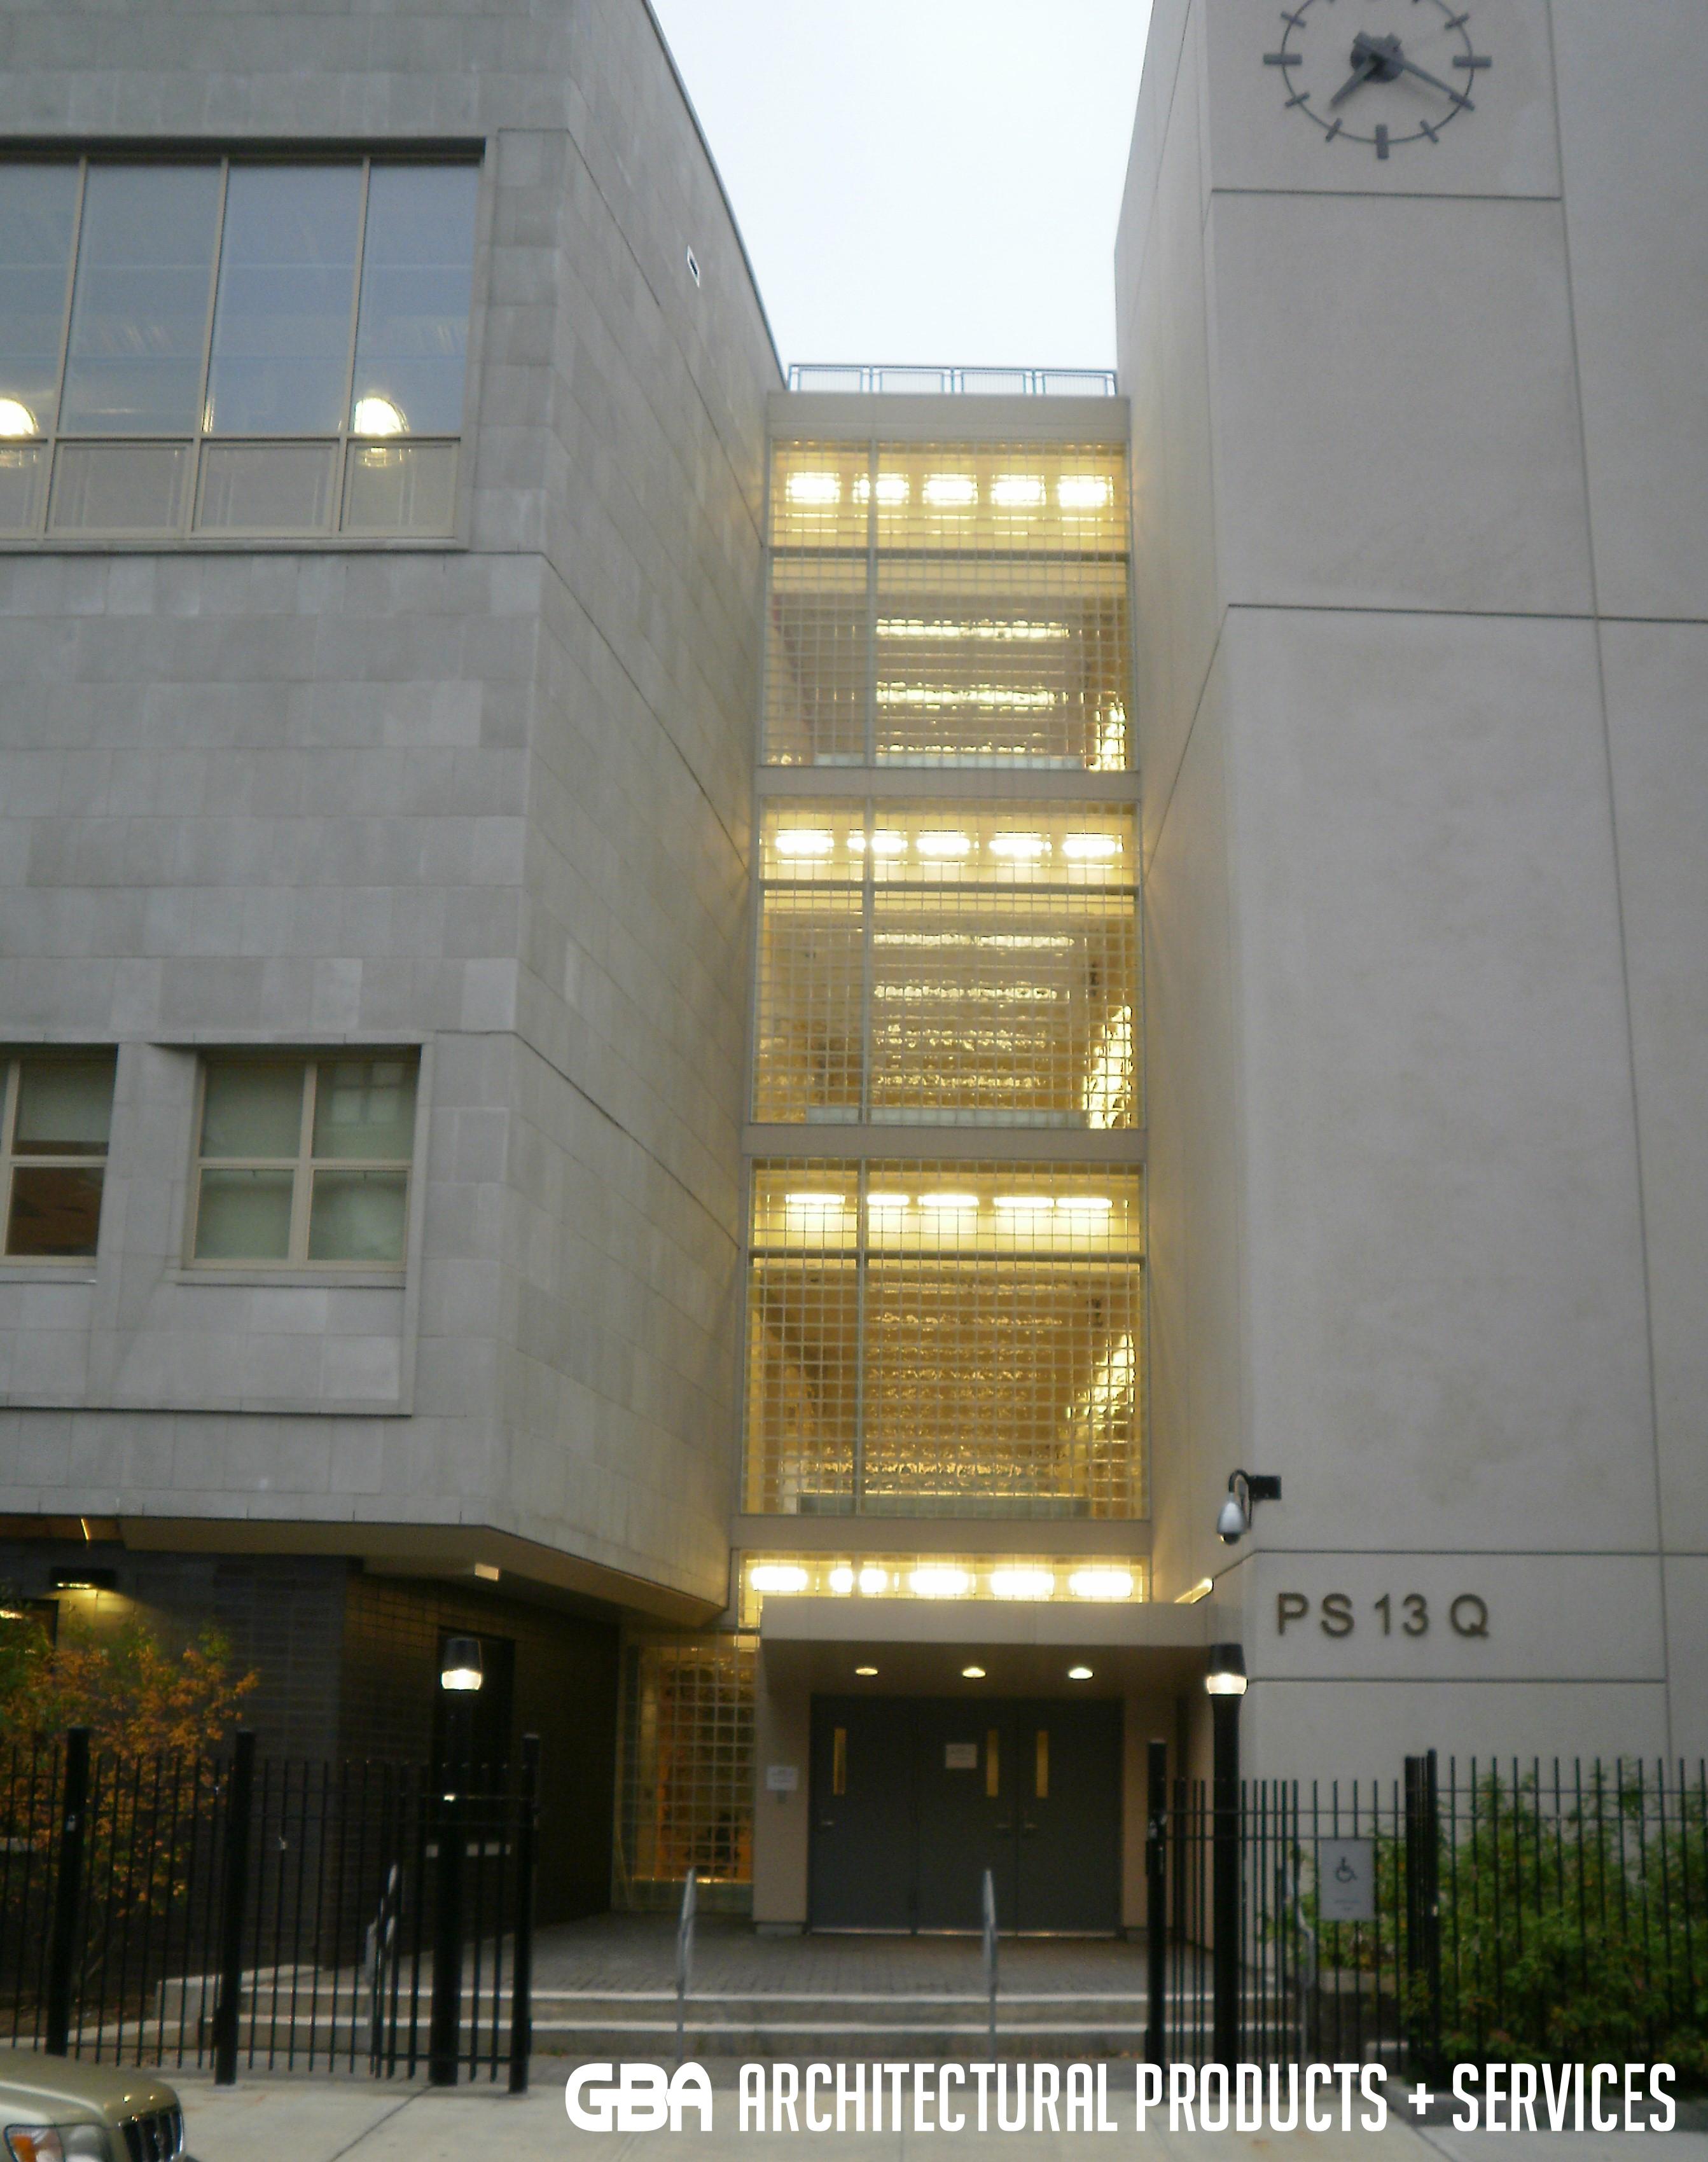 PS 13 (3)